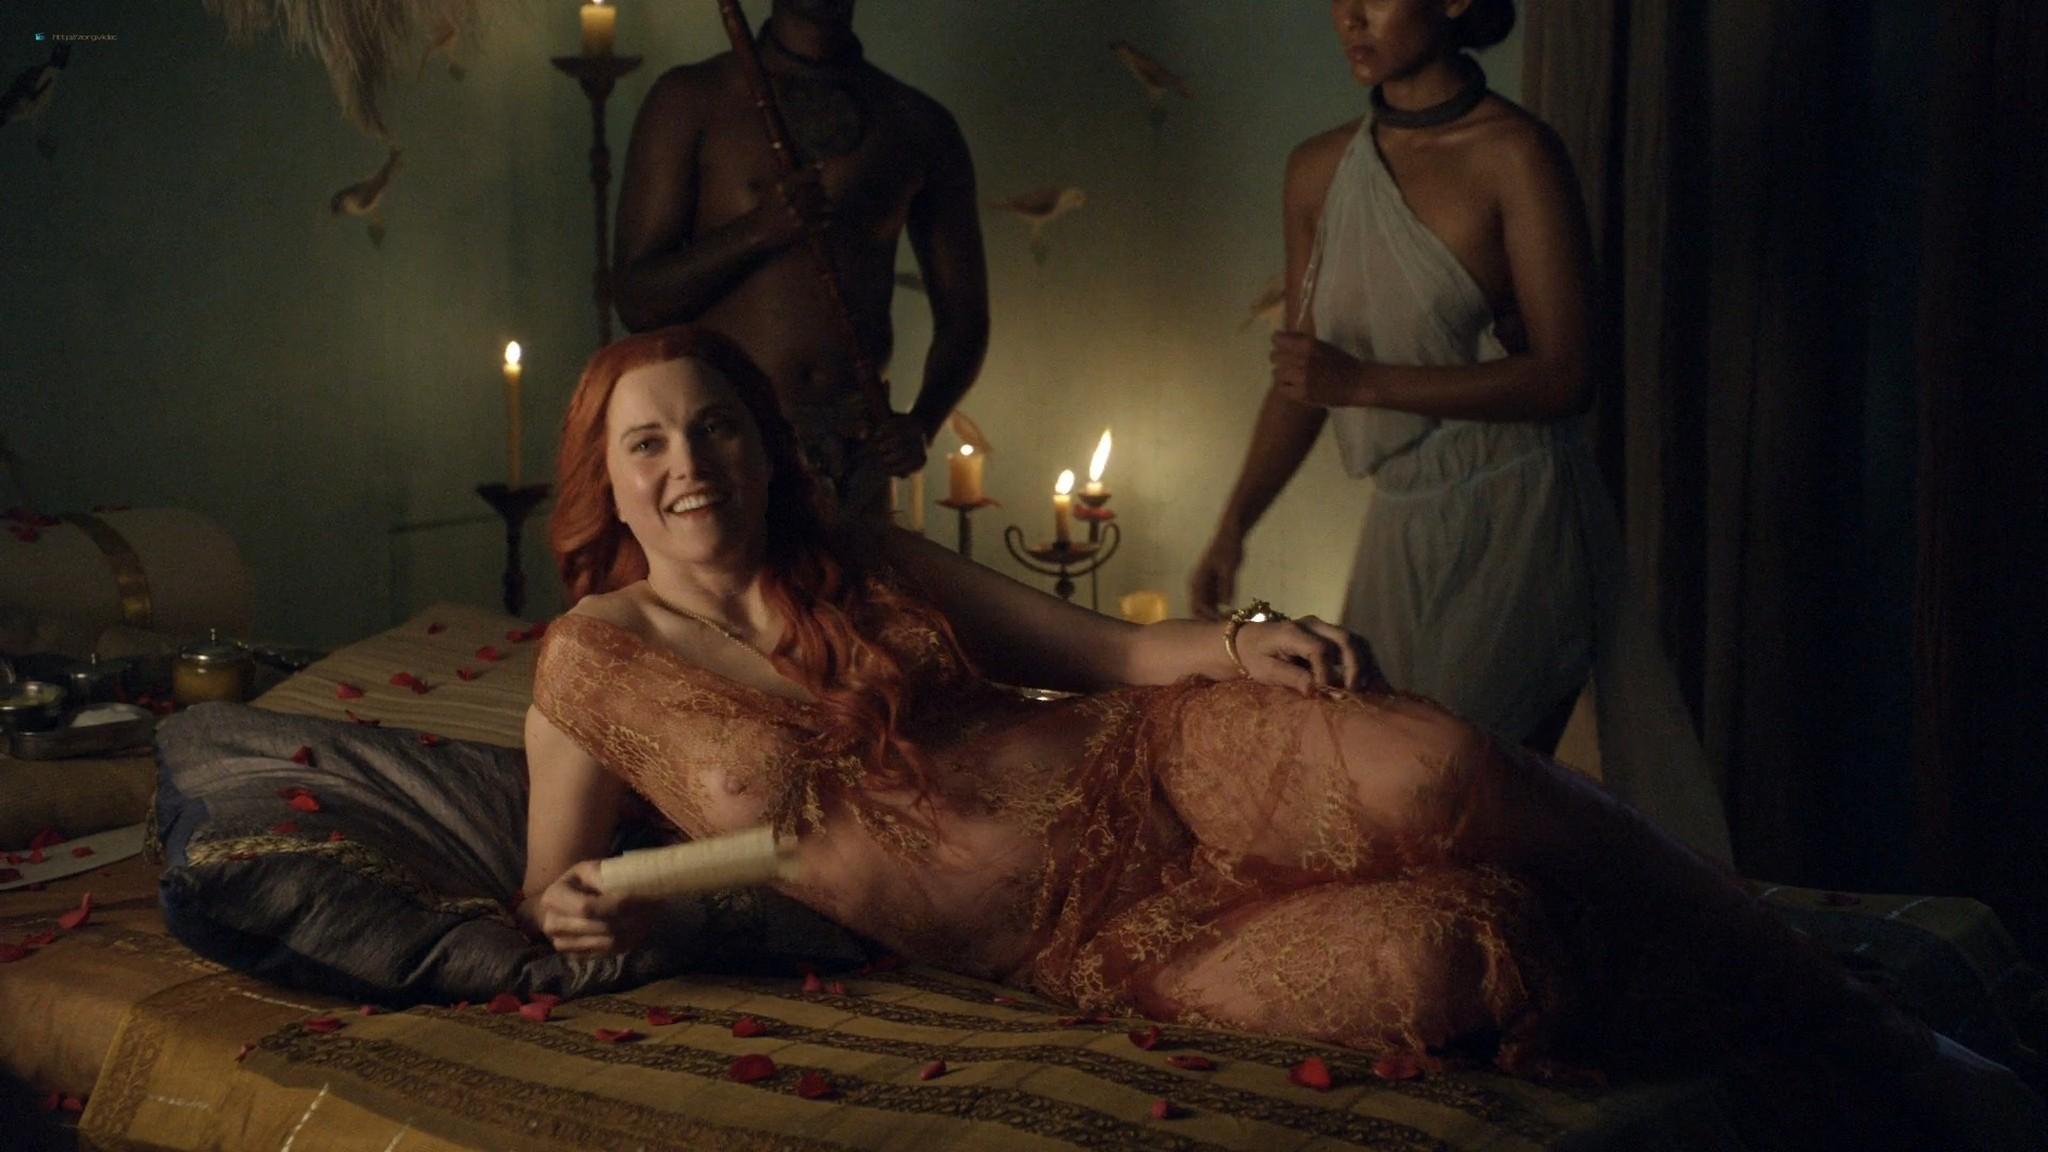 Lucy Lawless nude sex Erin Cummings, Aria Dickson nude too - Spartacus - Sacramentum Gladiatorum (2010) s1e2 HD 1080p (8)